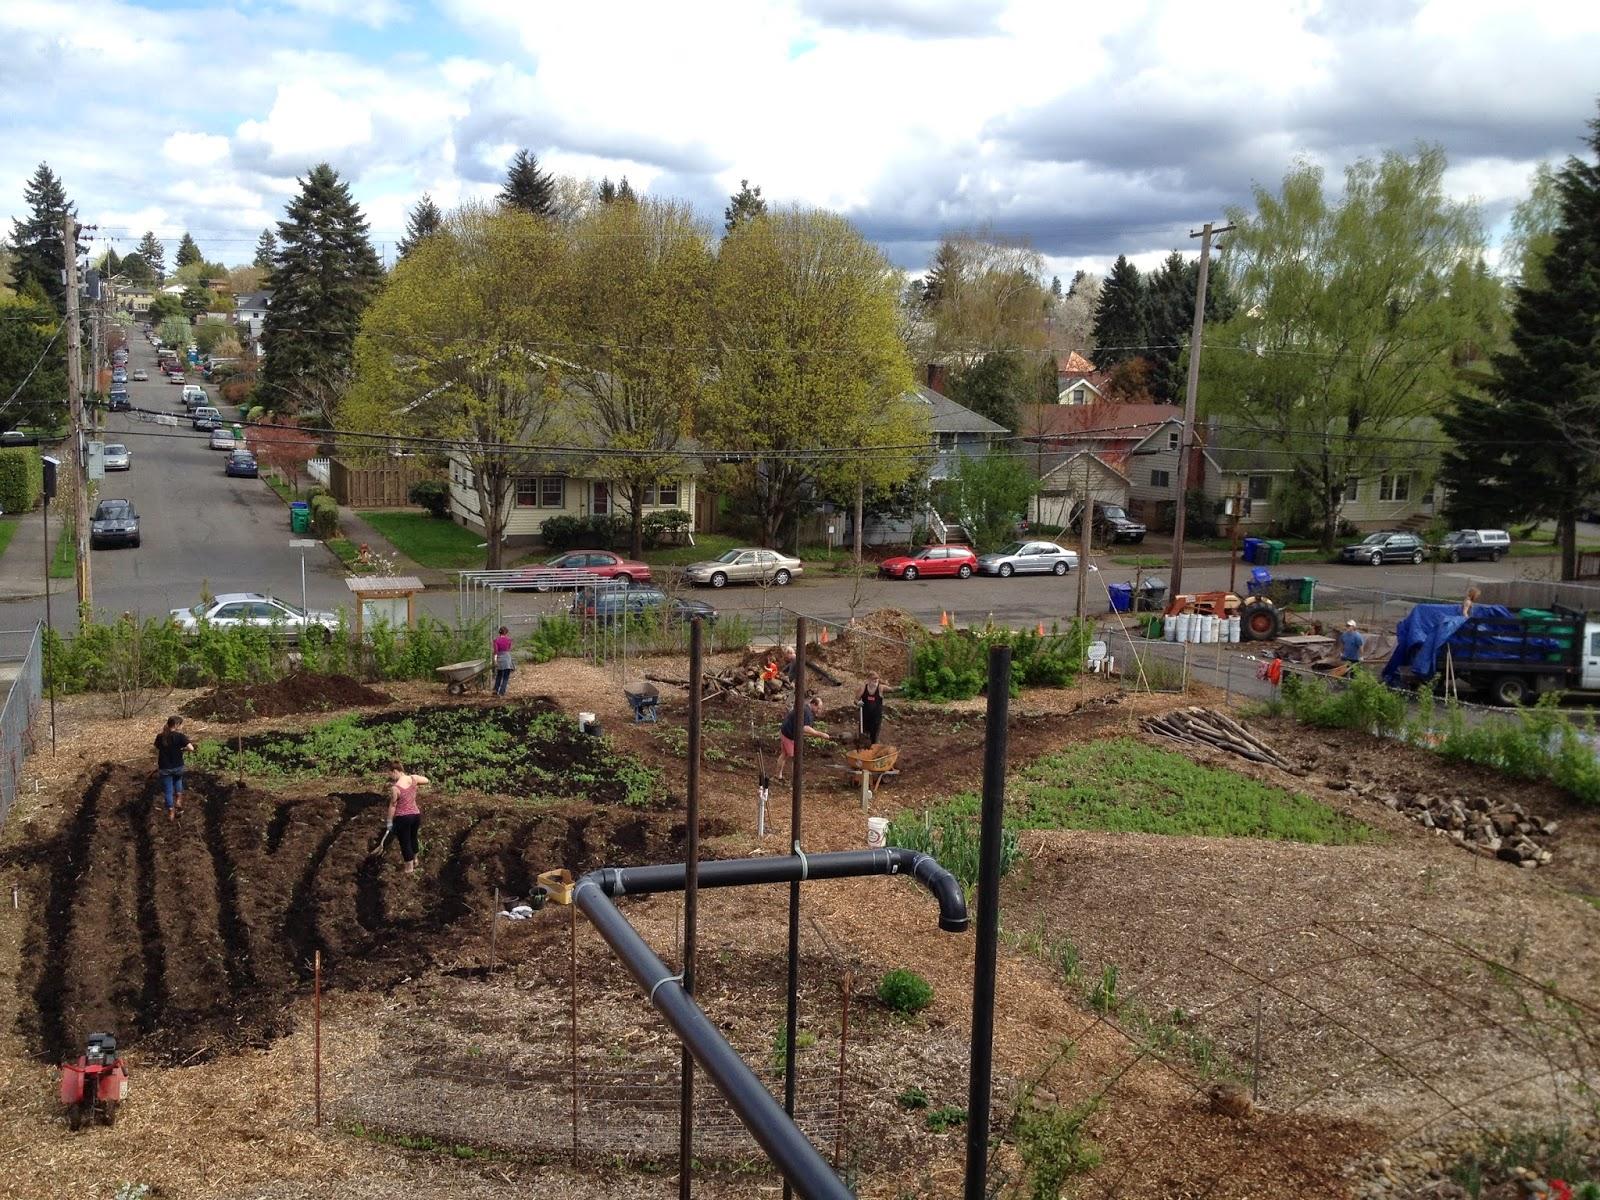 Nature, Nurture, Grow: A Busy Weekend in the Garden